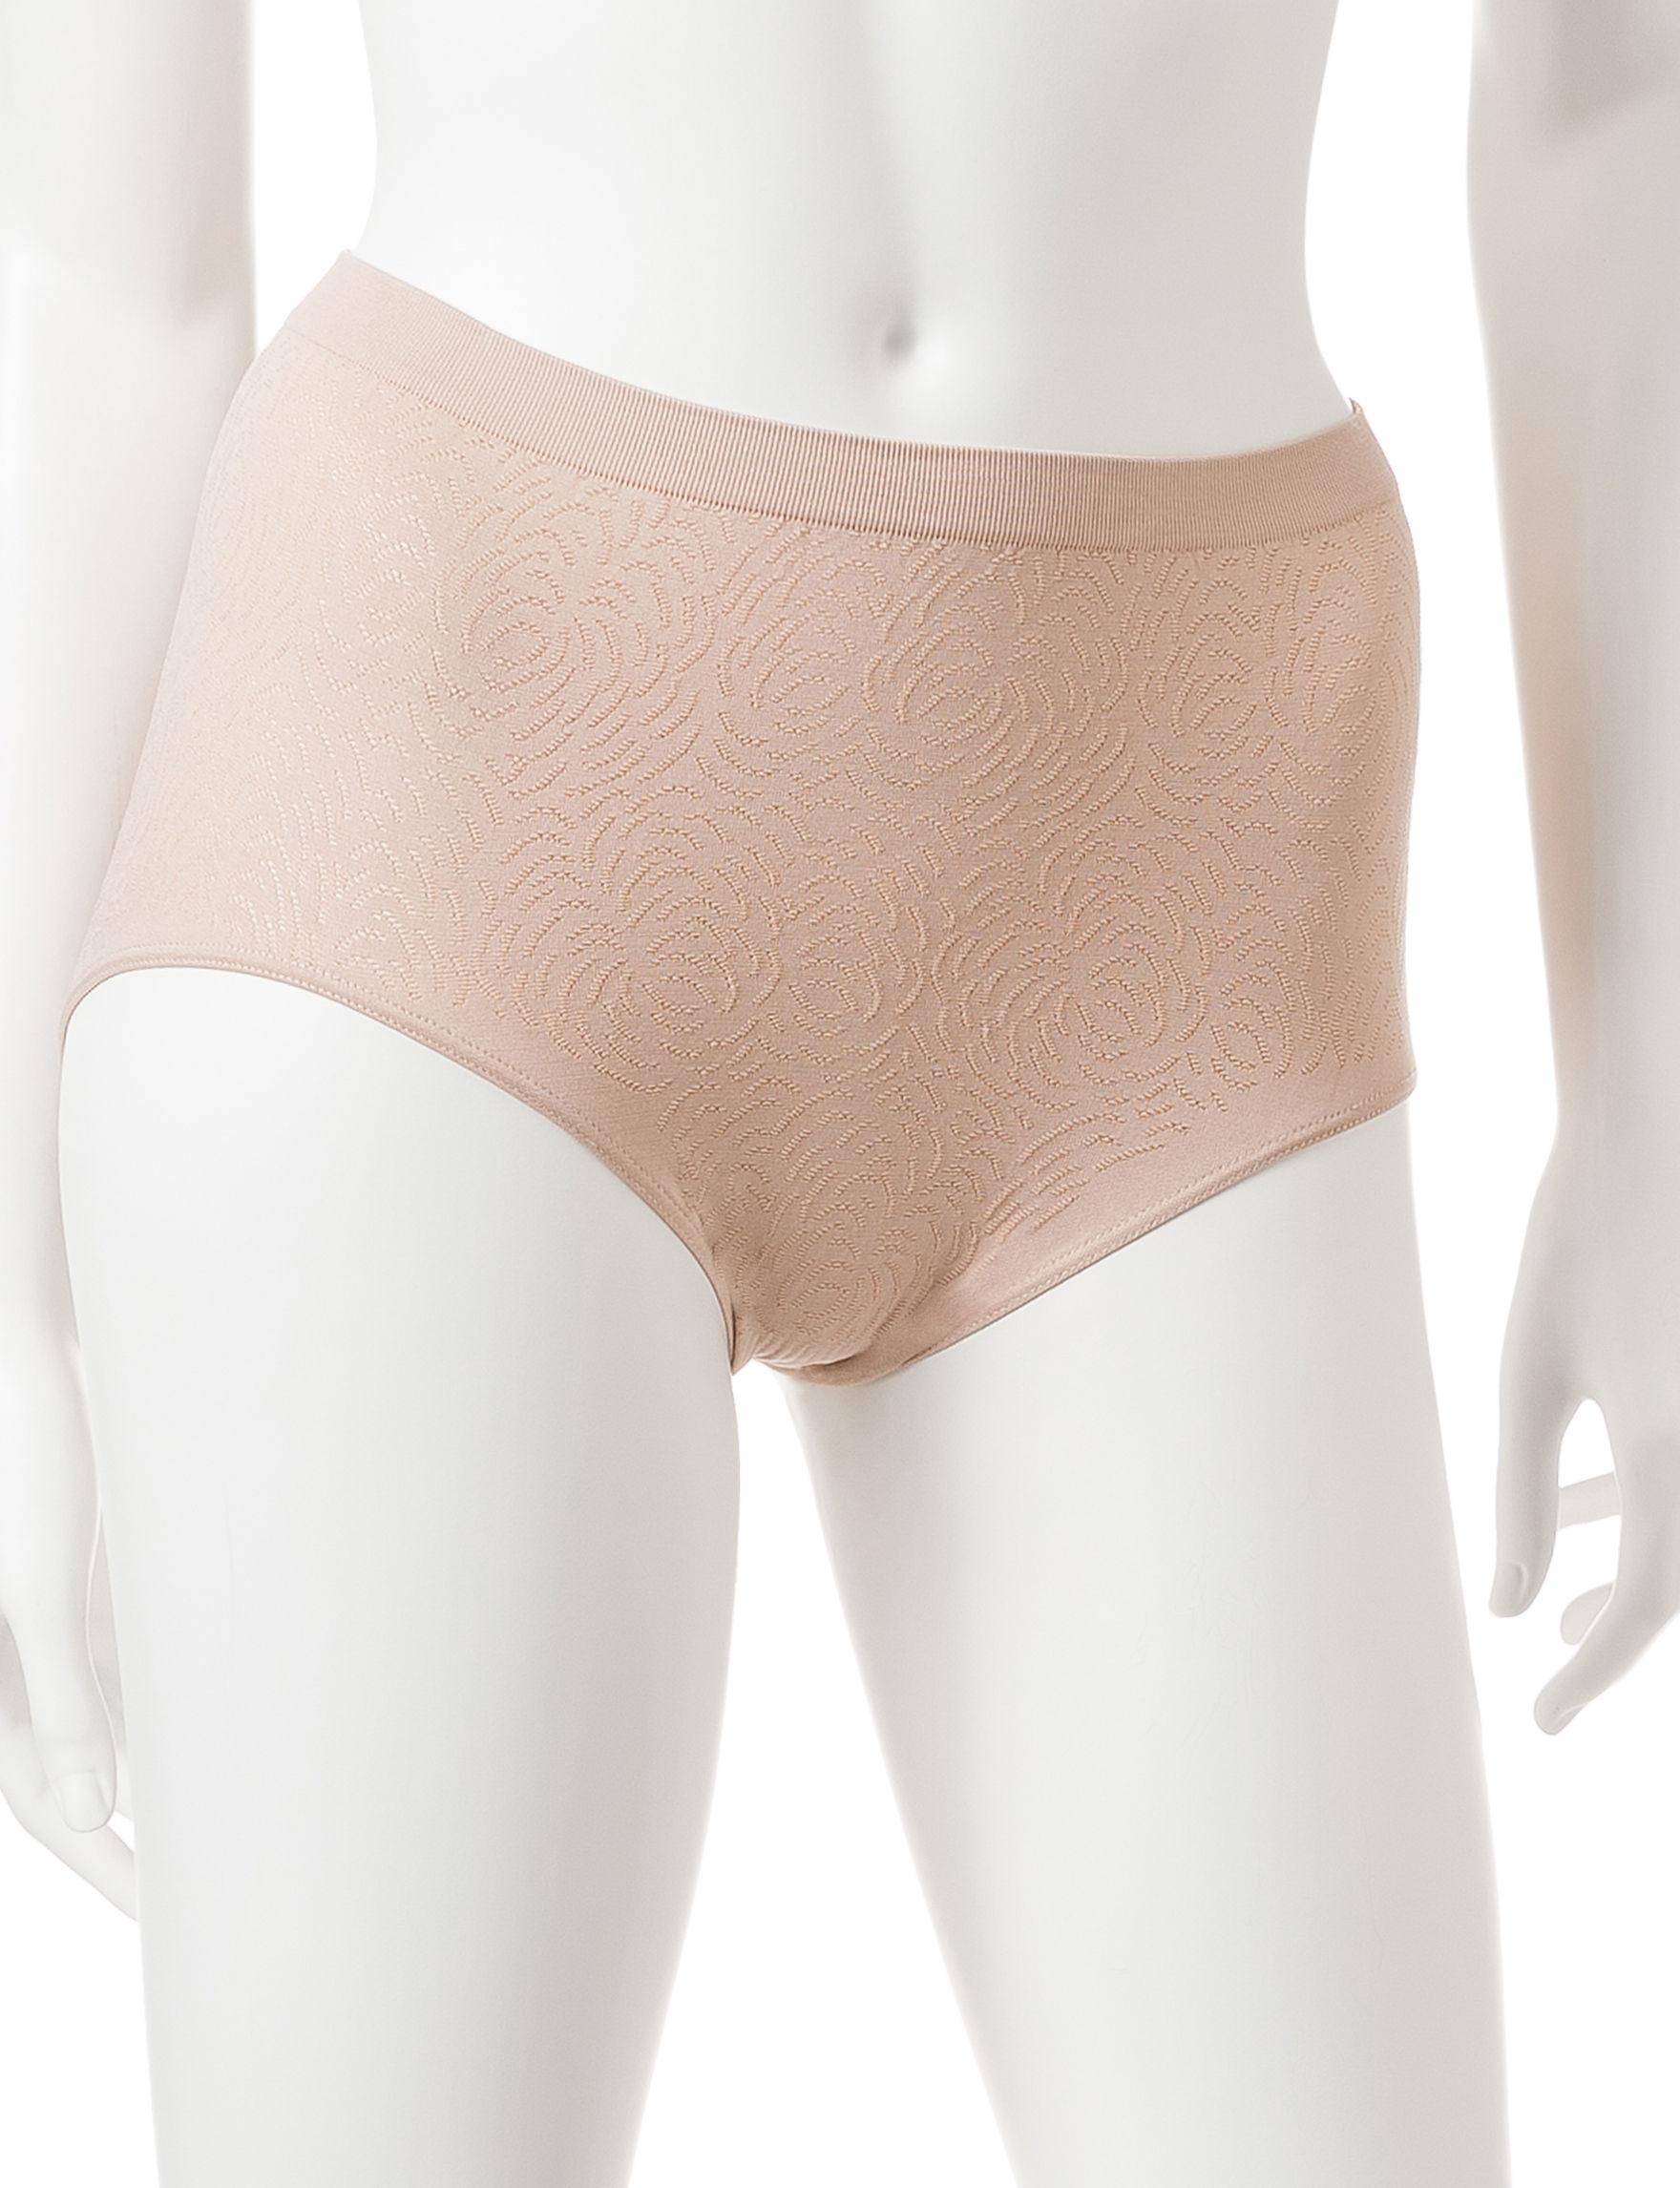 Bali Nude Panties Briefs High Waist Seamless